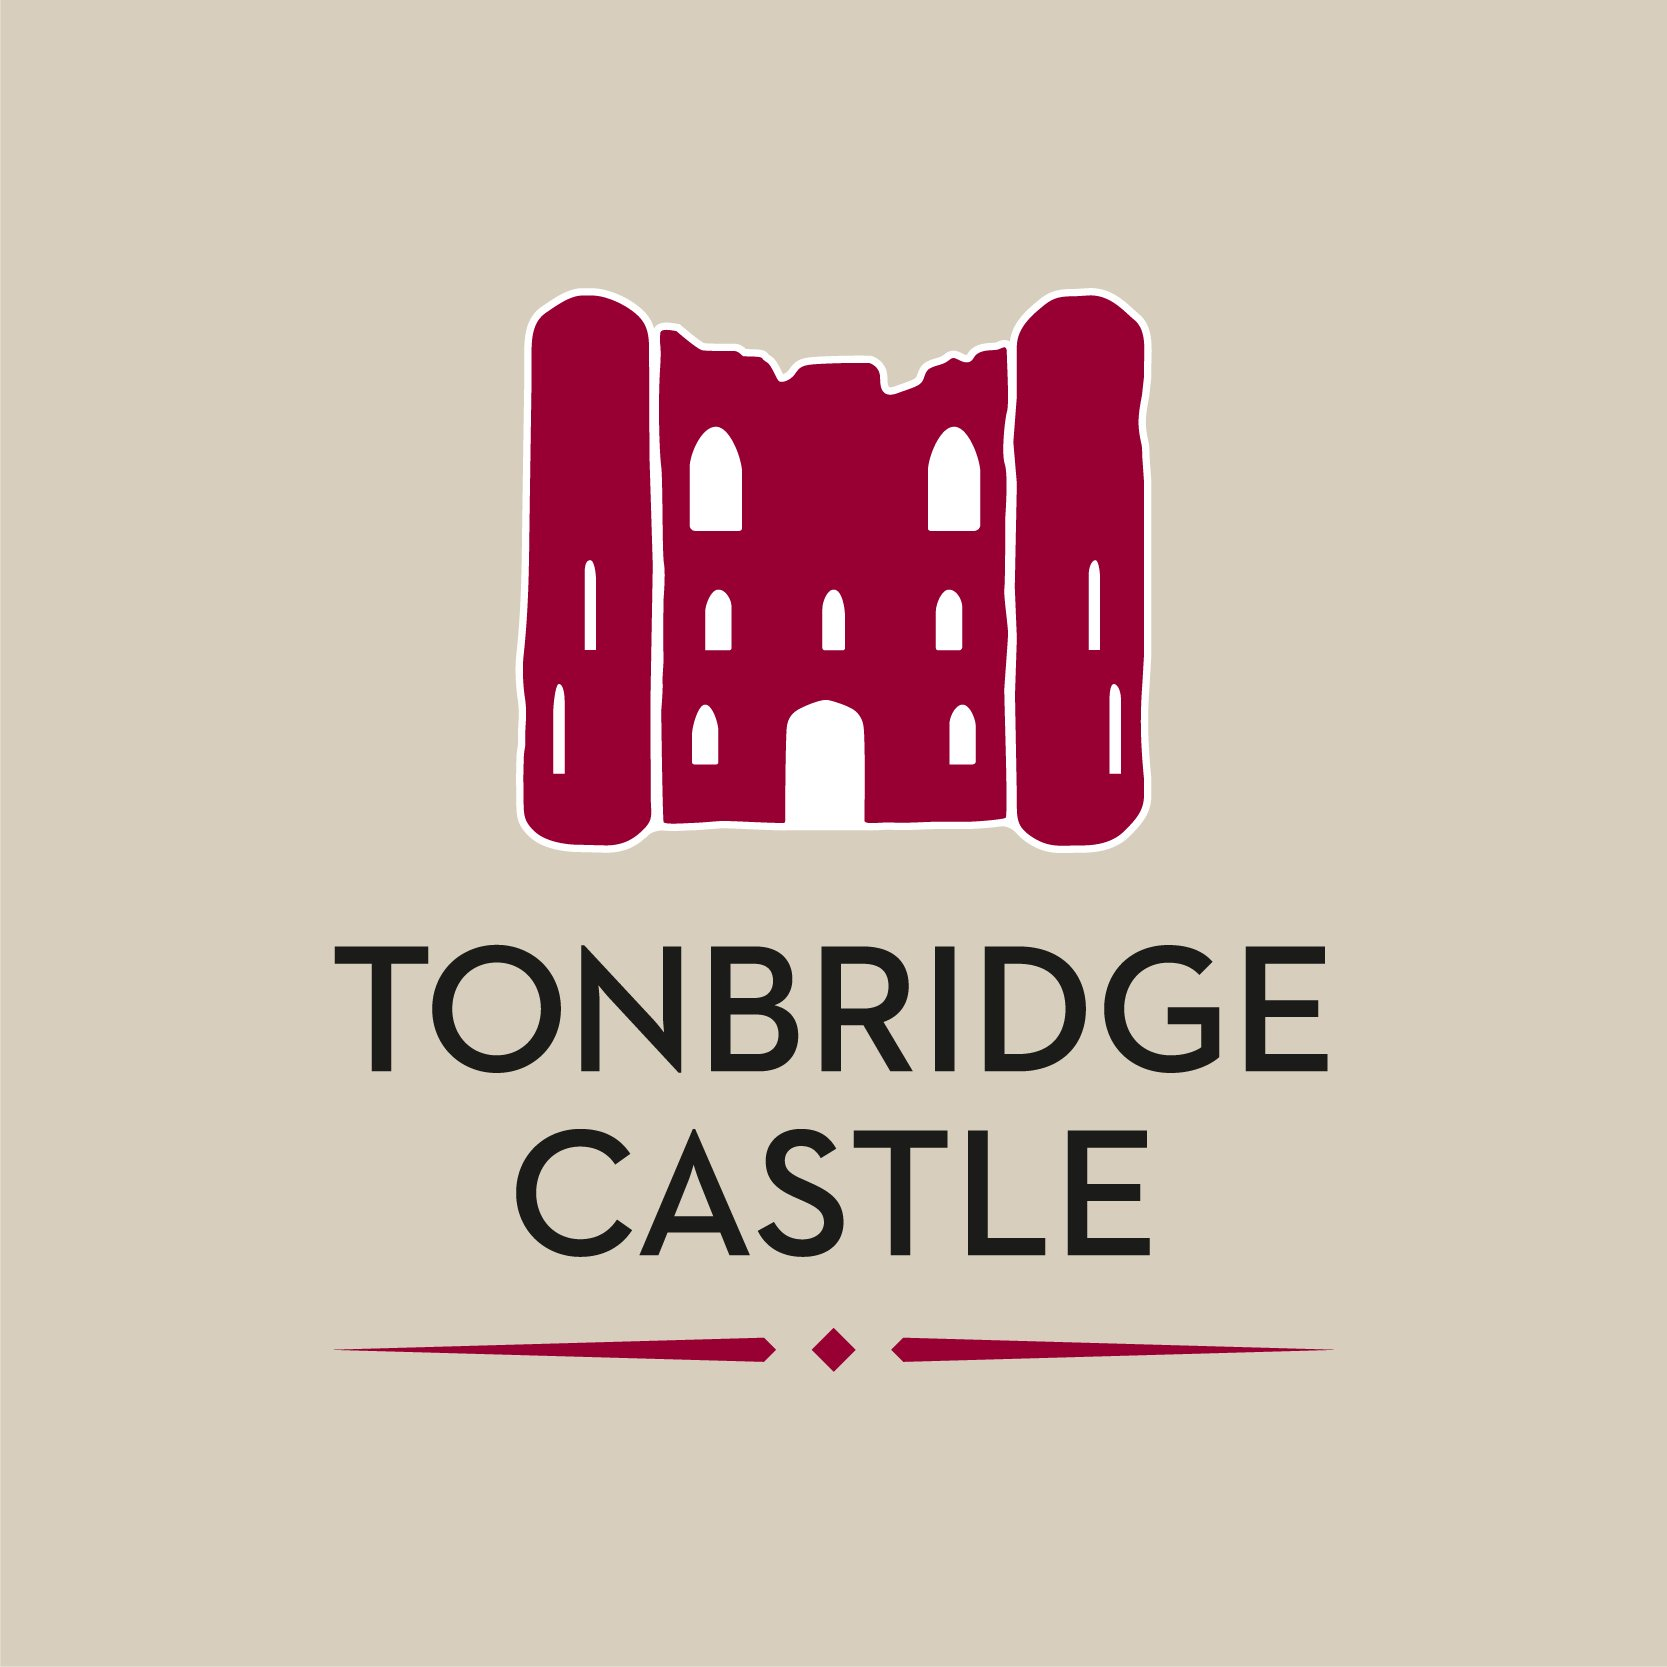 Free dating sites in tonbridge